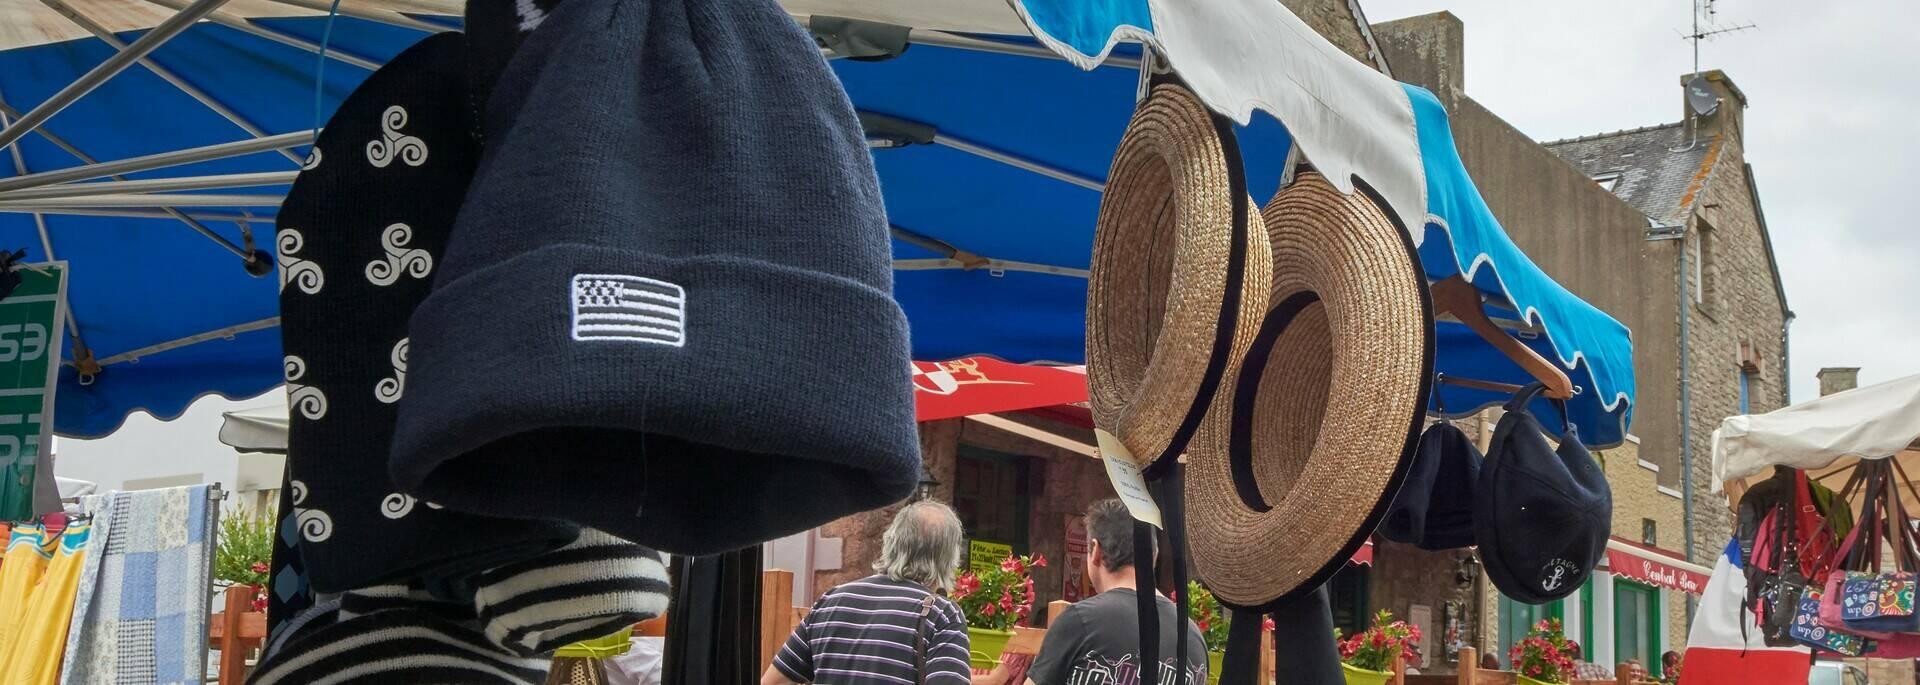 Market day in Le Faouët © MA Gouret-Puillandre